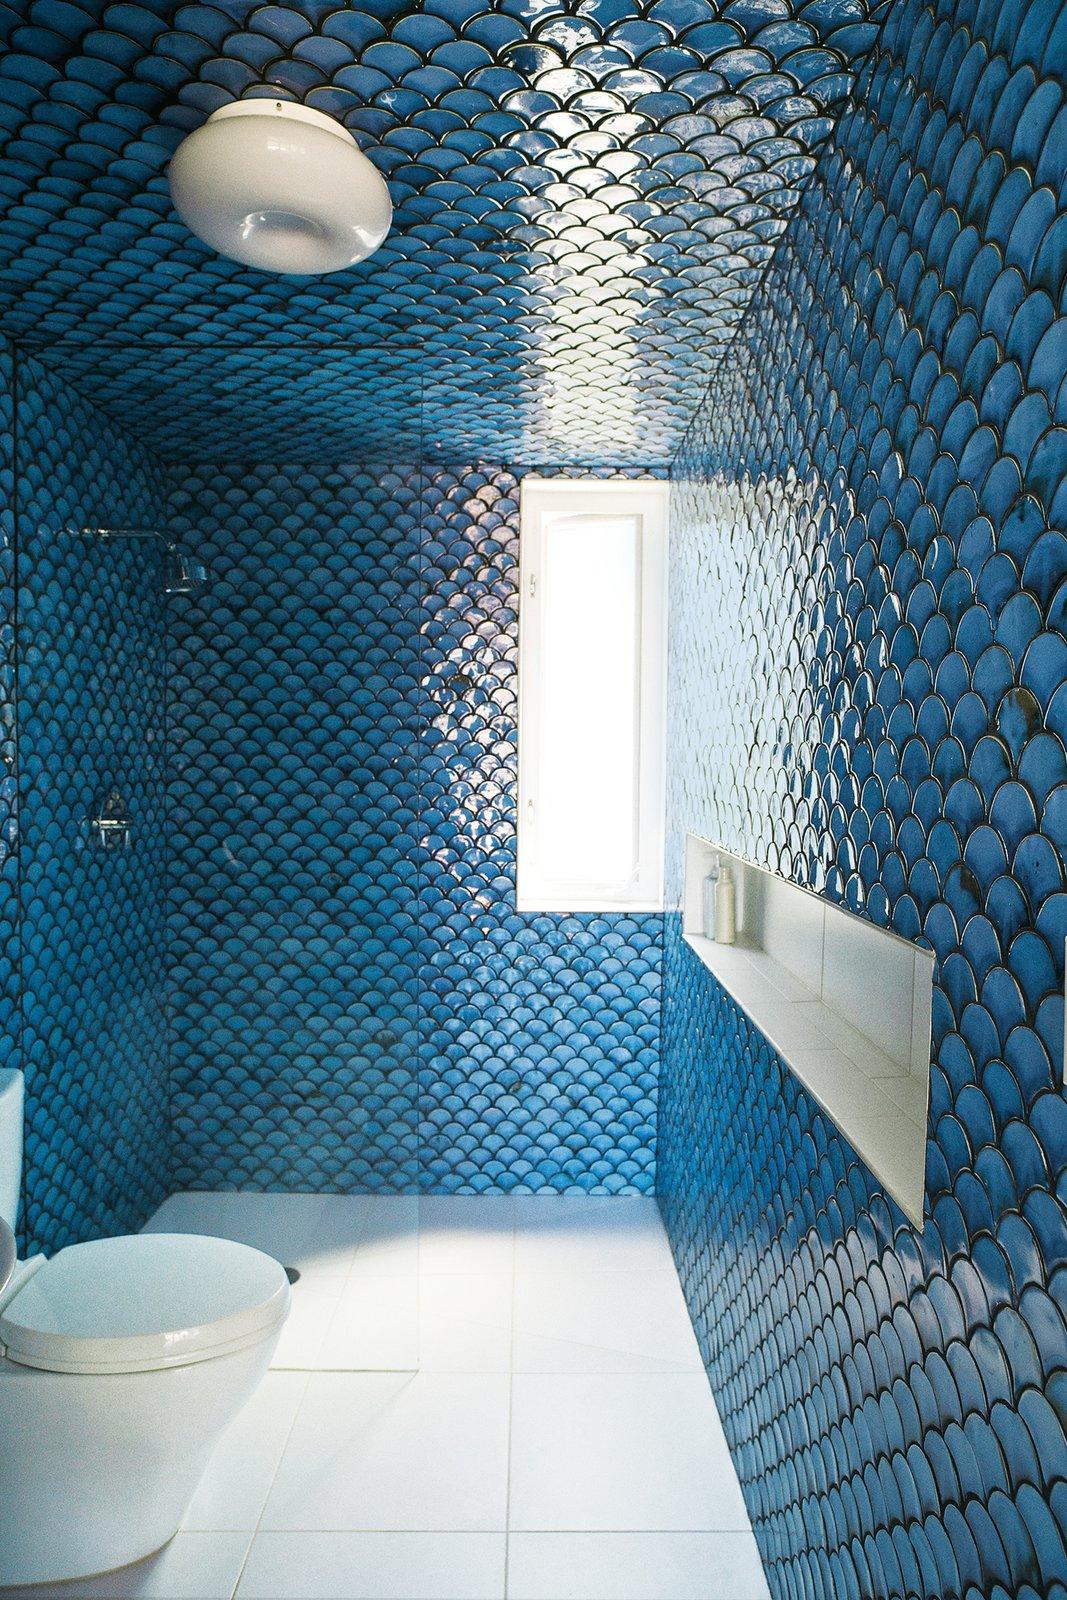 #bath #spa #bath&spa #modern #interior #interiordesign #bathroom #shower #tile #walltile #desimio #renovation  Photo by Paul Barbera  Tagged: Bath Room, Ceramic Tile Floor, and Ceramic Tile Wall. Bath & Spa Intrigue - Photo 3 of 22